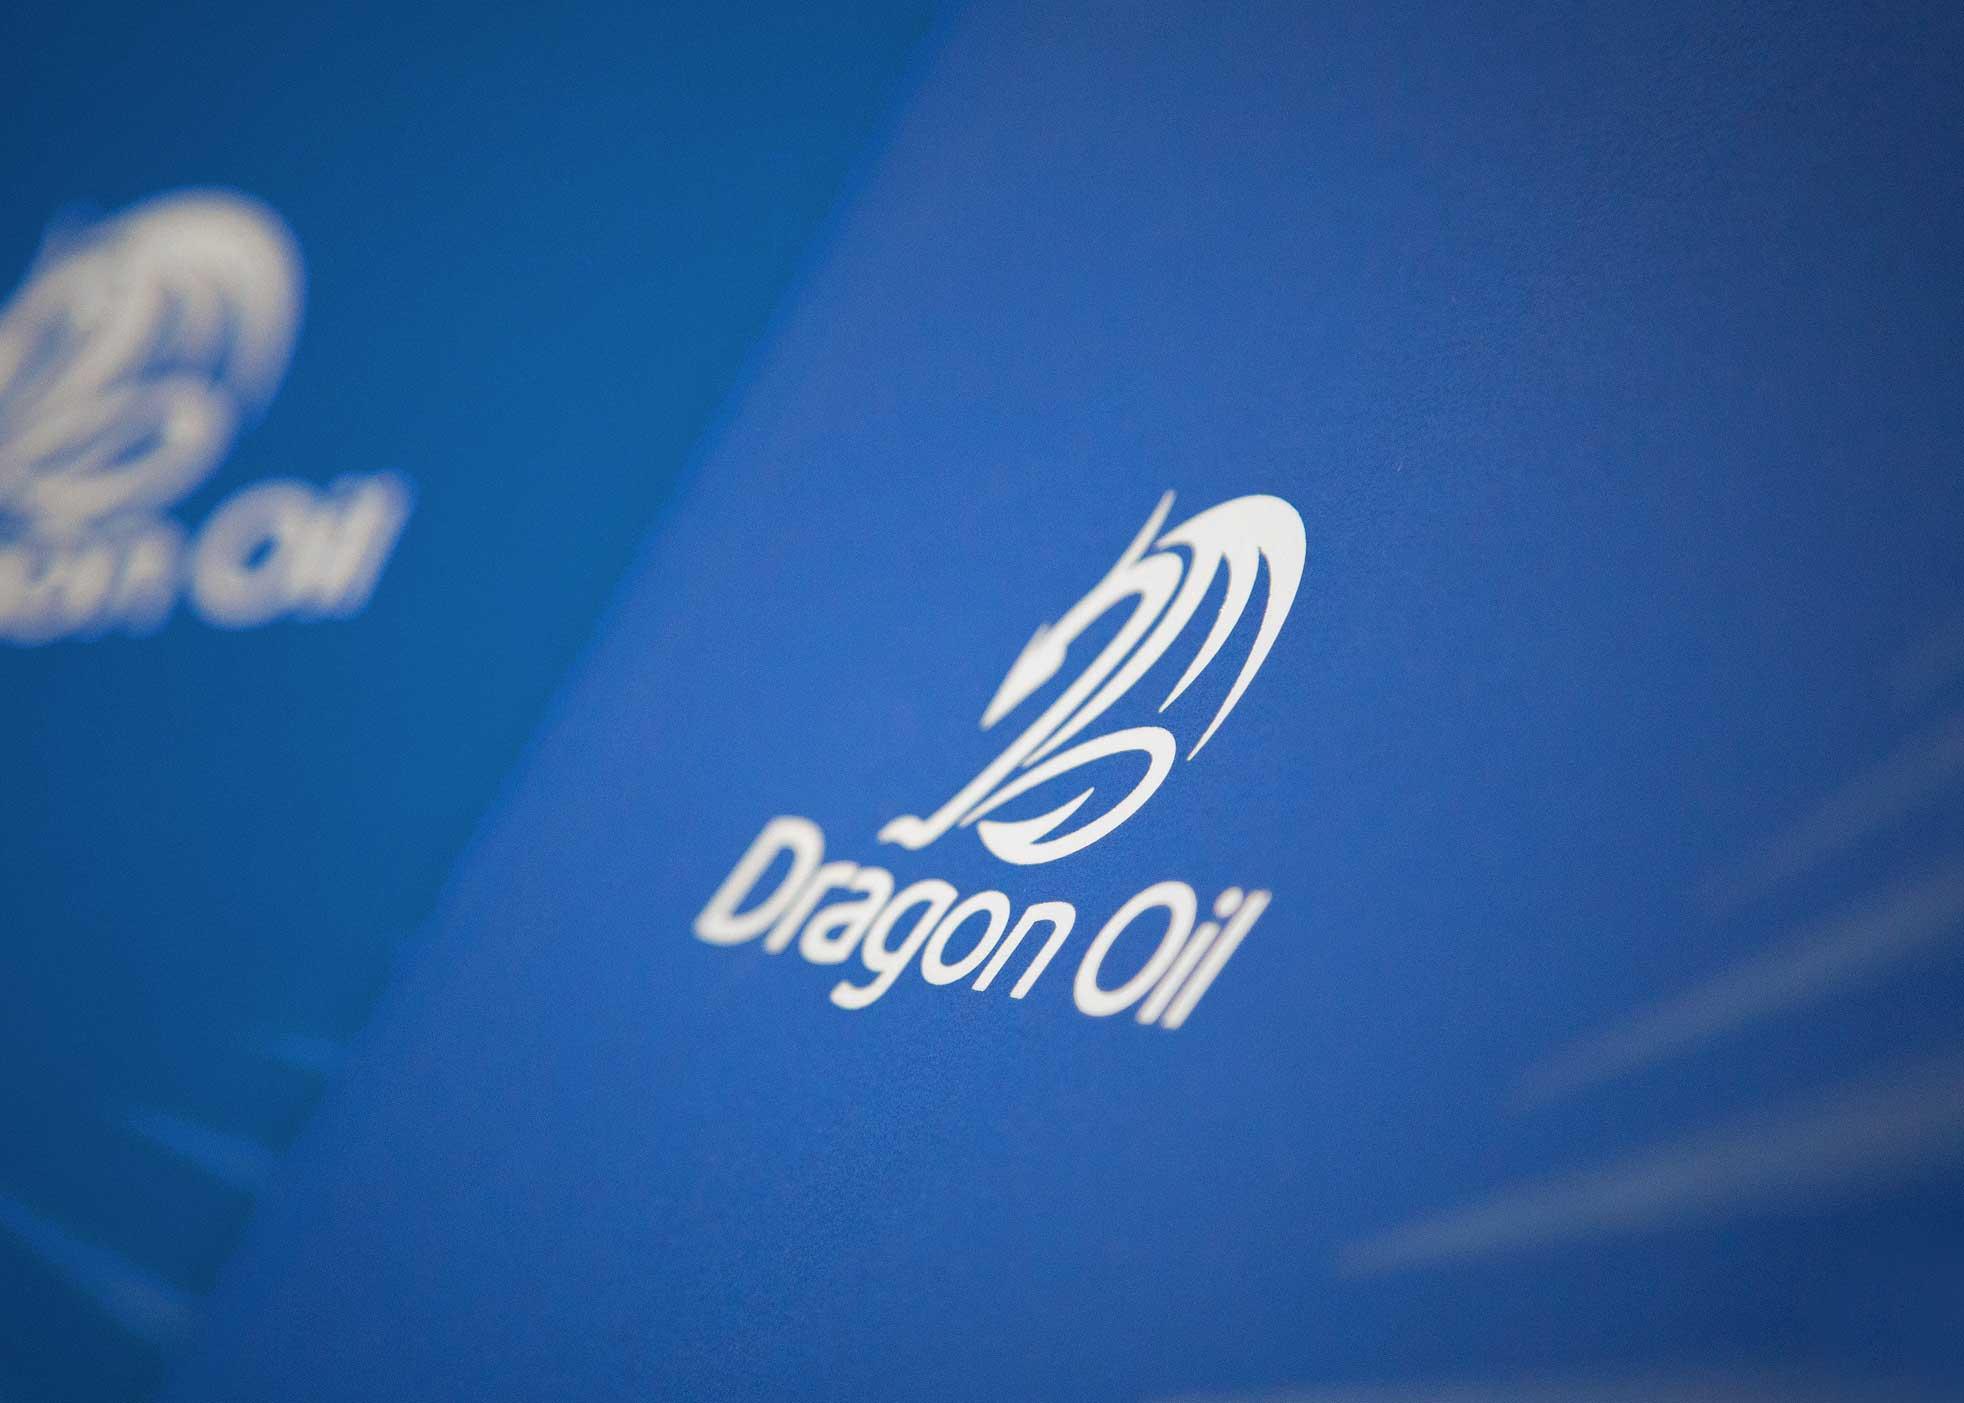 Showcase oil & gas Branding Agency work in Dubai & London.